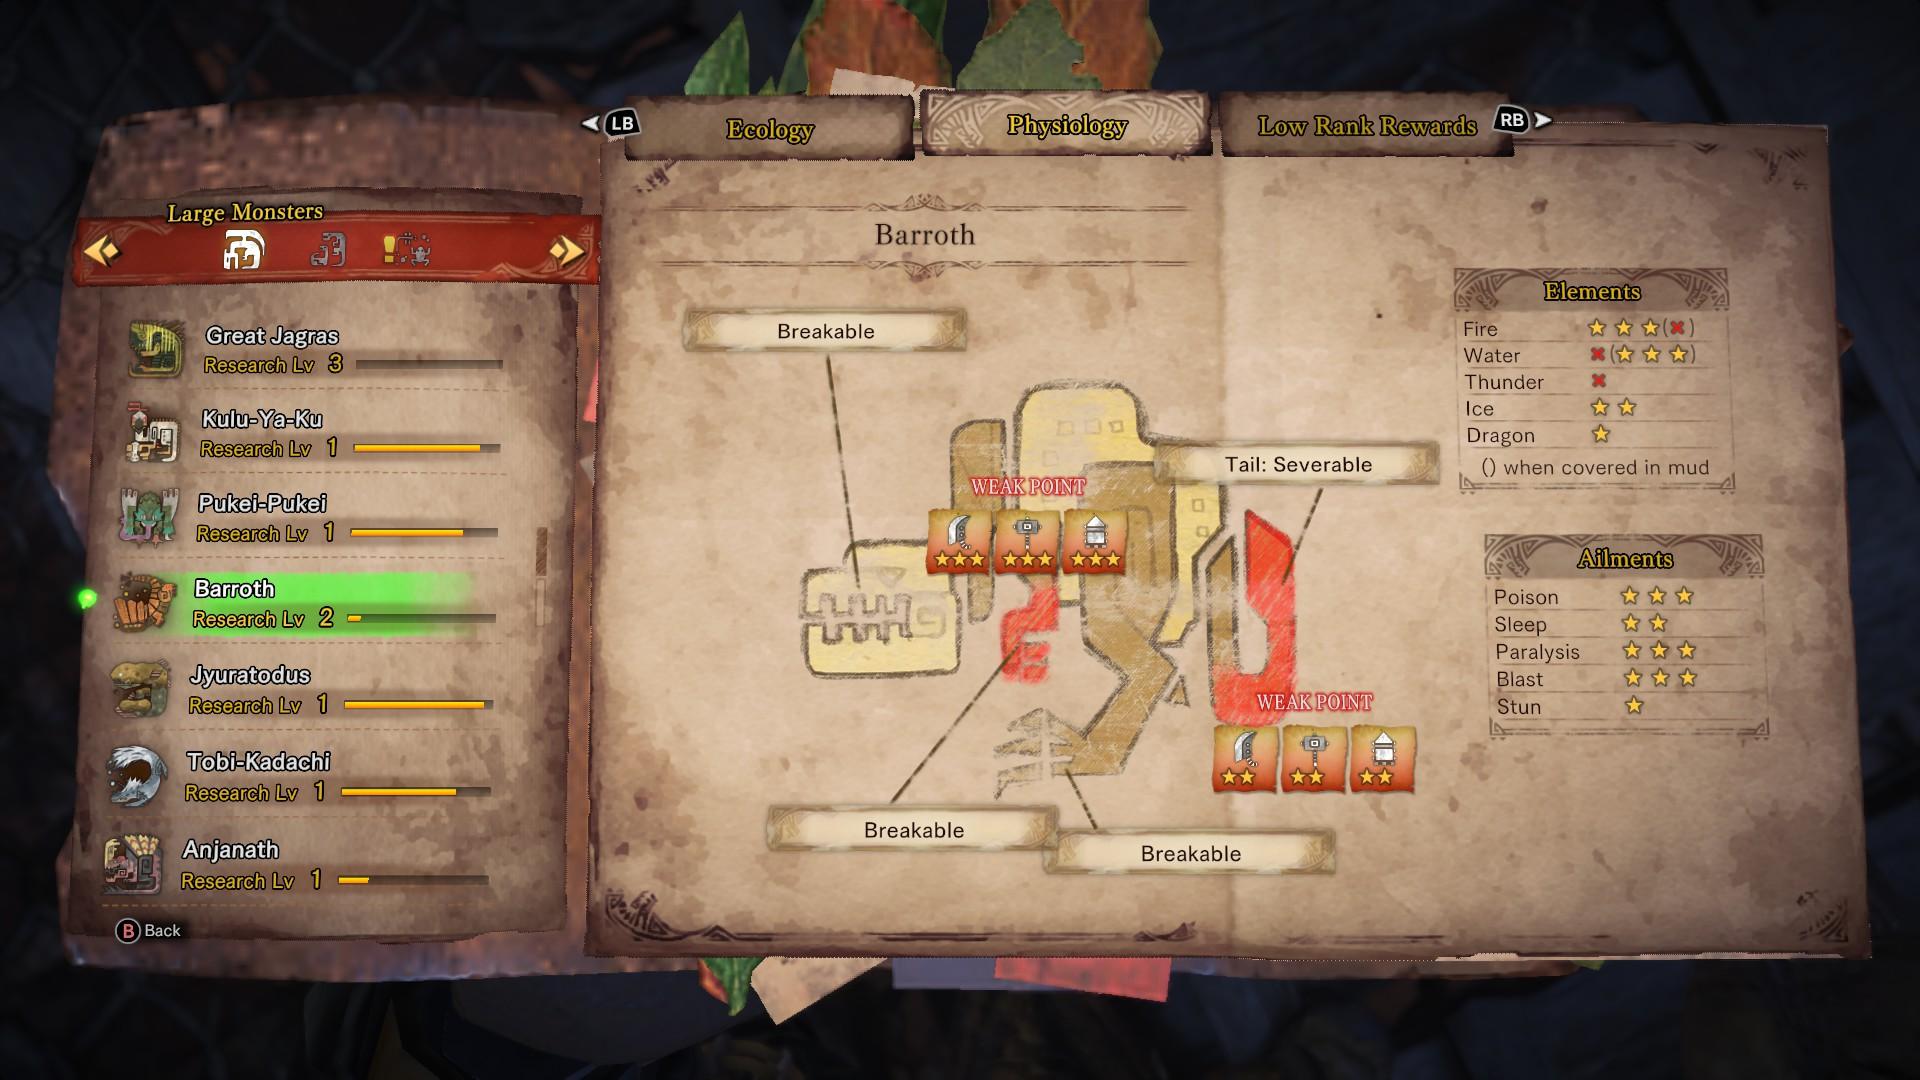 Monster field guide entry for Barroth